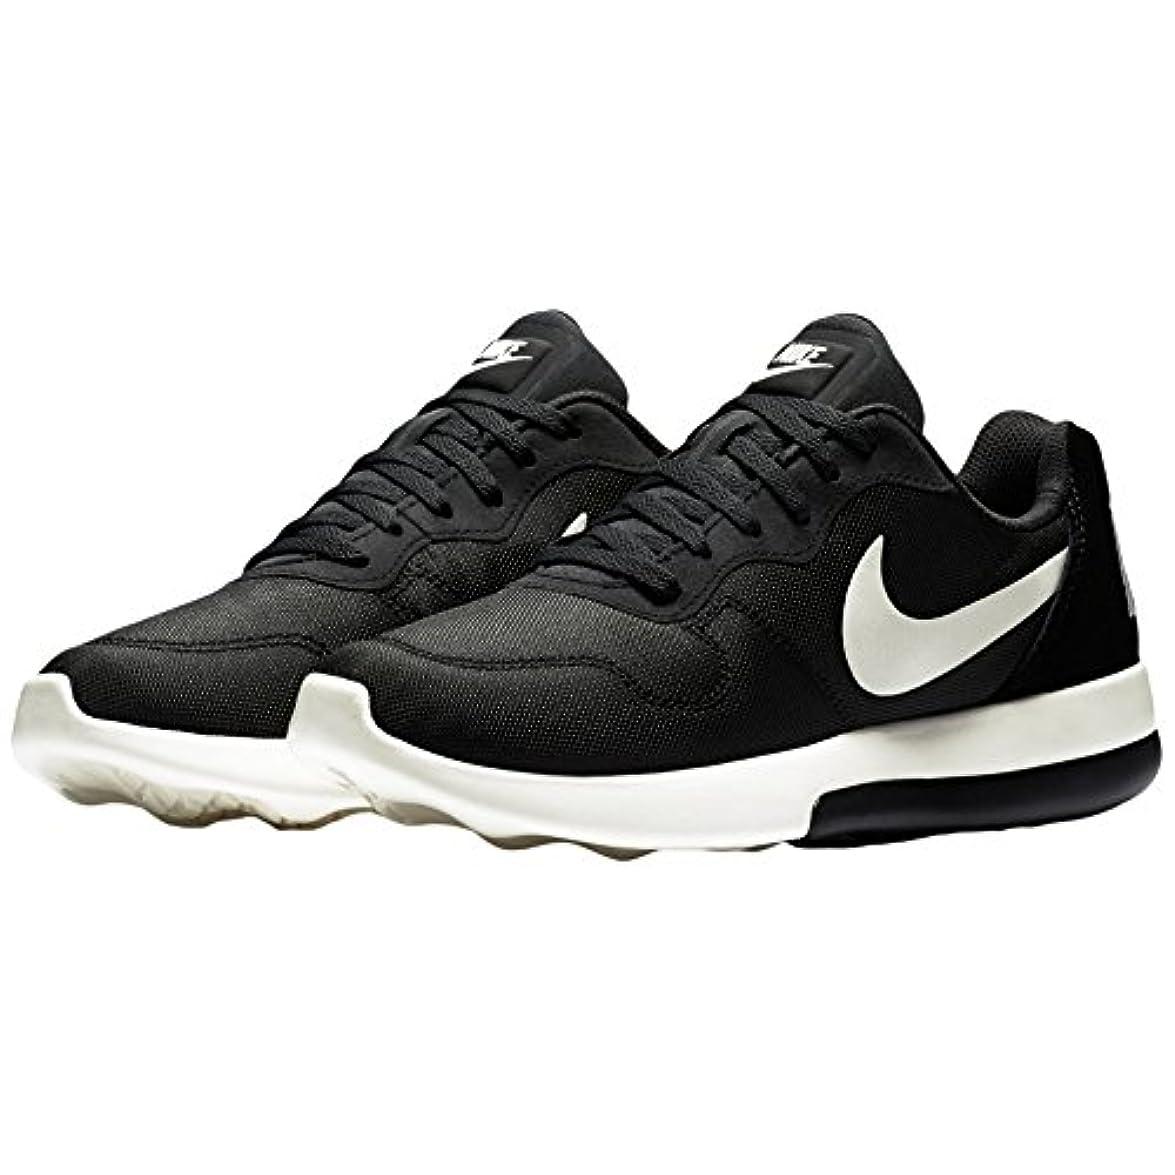 Scarpe Ginnastica Donna Da 844901-001 Nike